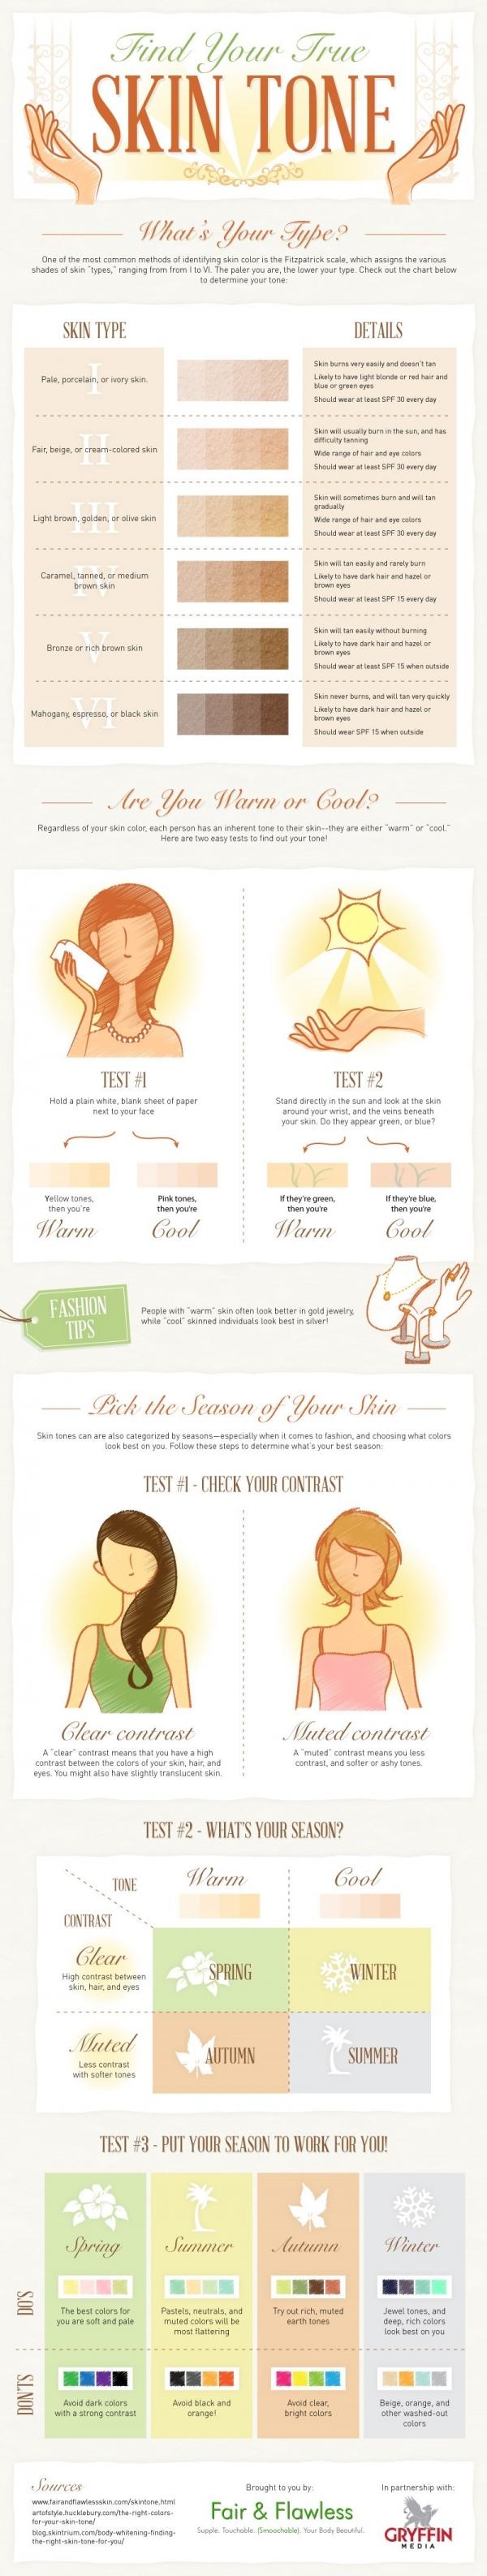 makeupandbodyblog:makeupaccordingtoyourskintone